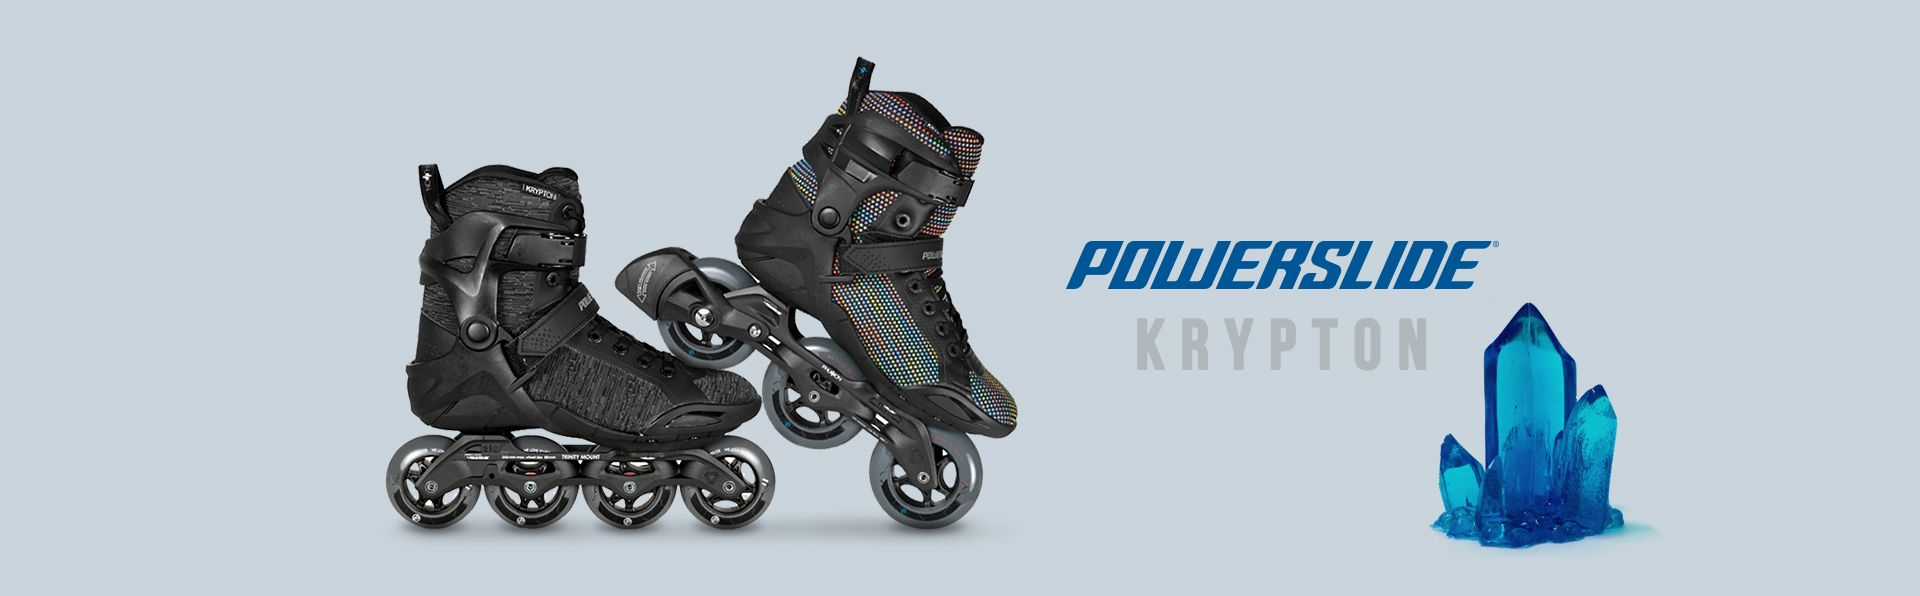 Powerslide - Krypton